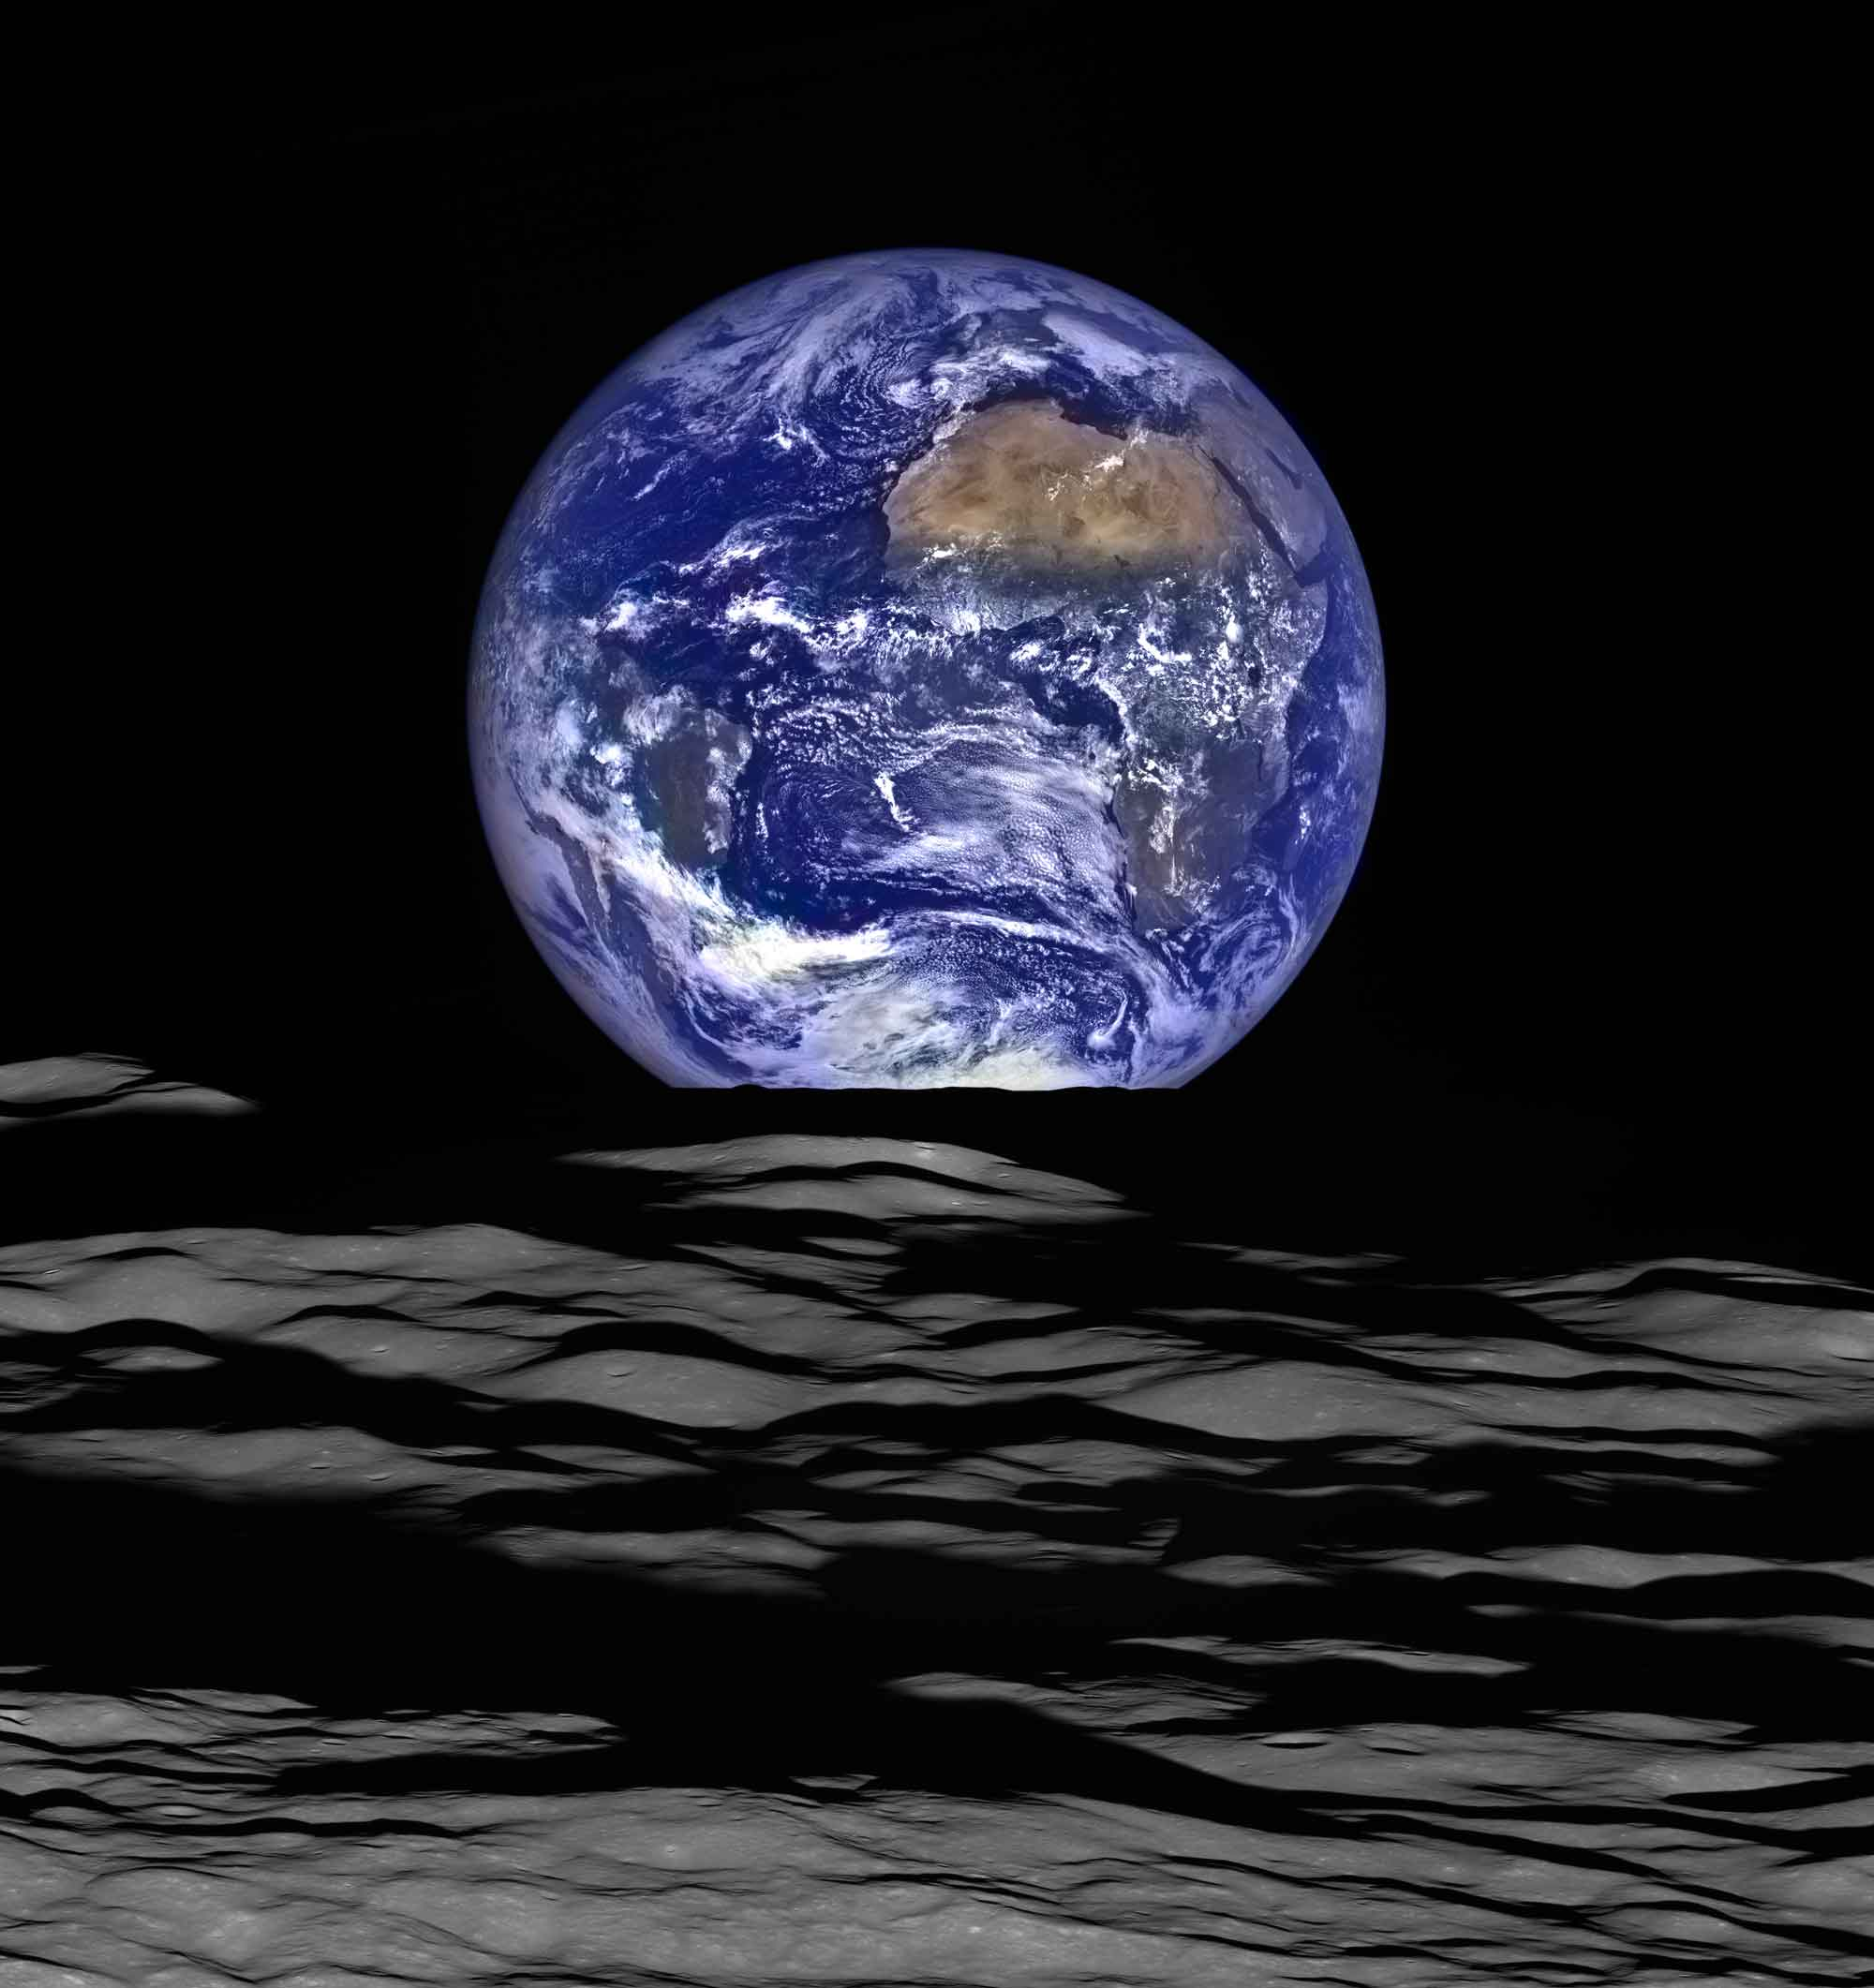 Via Facebook Home Beautiful Magazine Australia: 1968 Earthrise Image Reimagined « Earth Imaging Journal